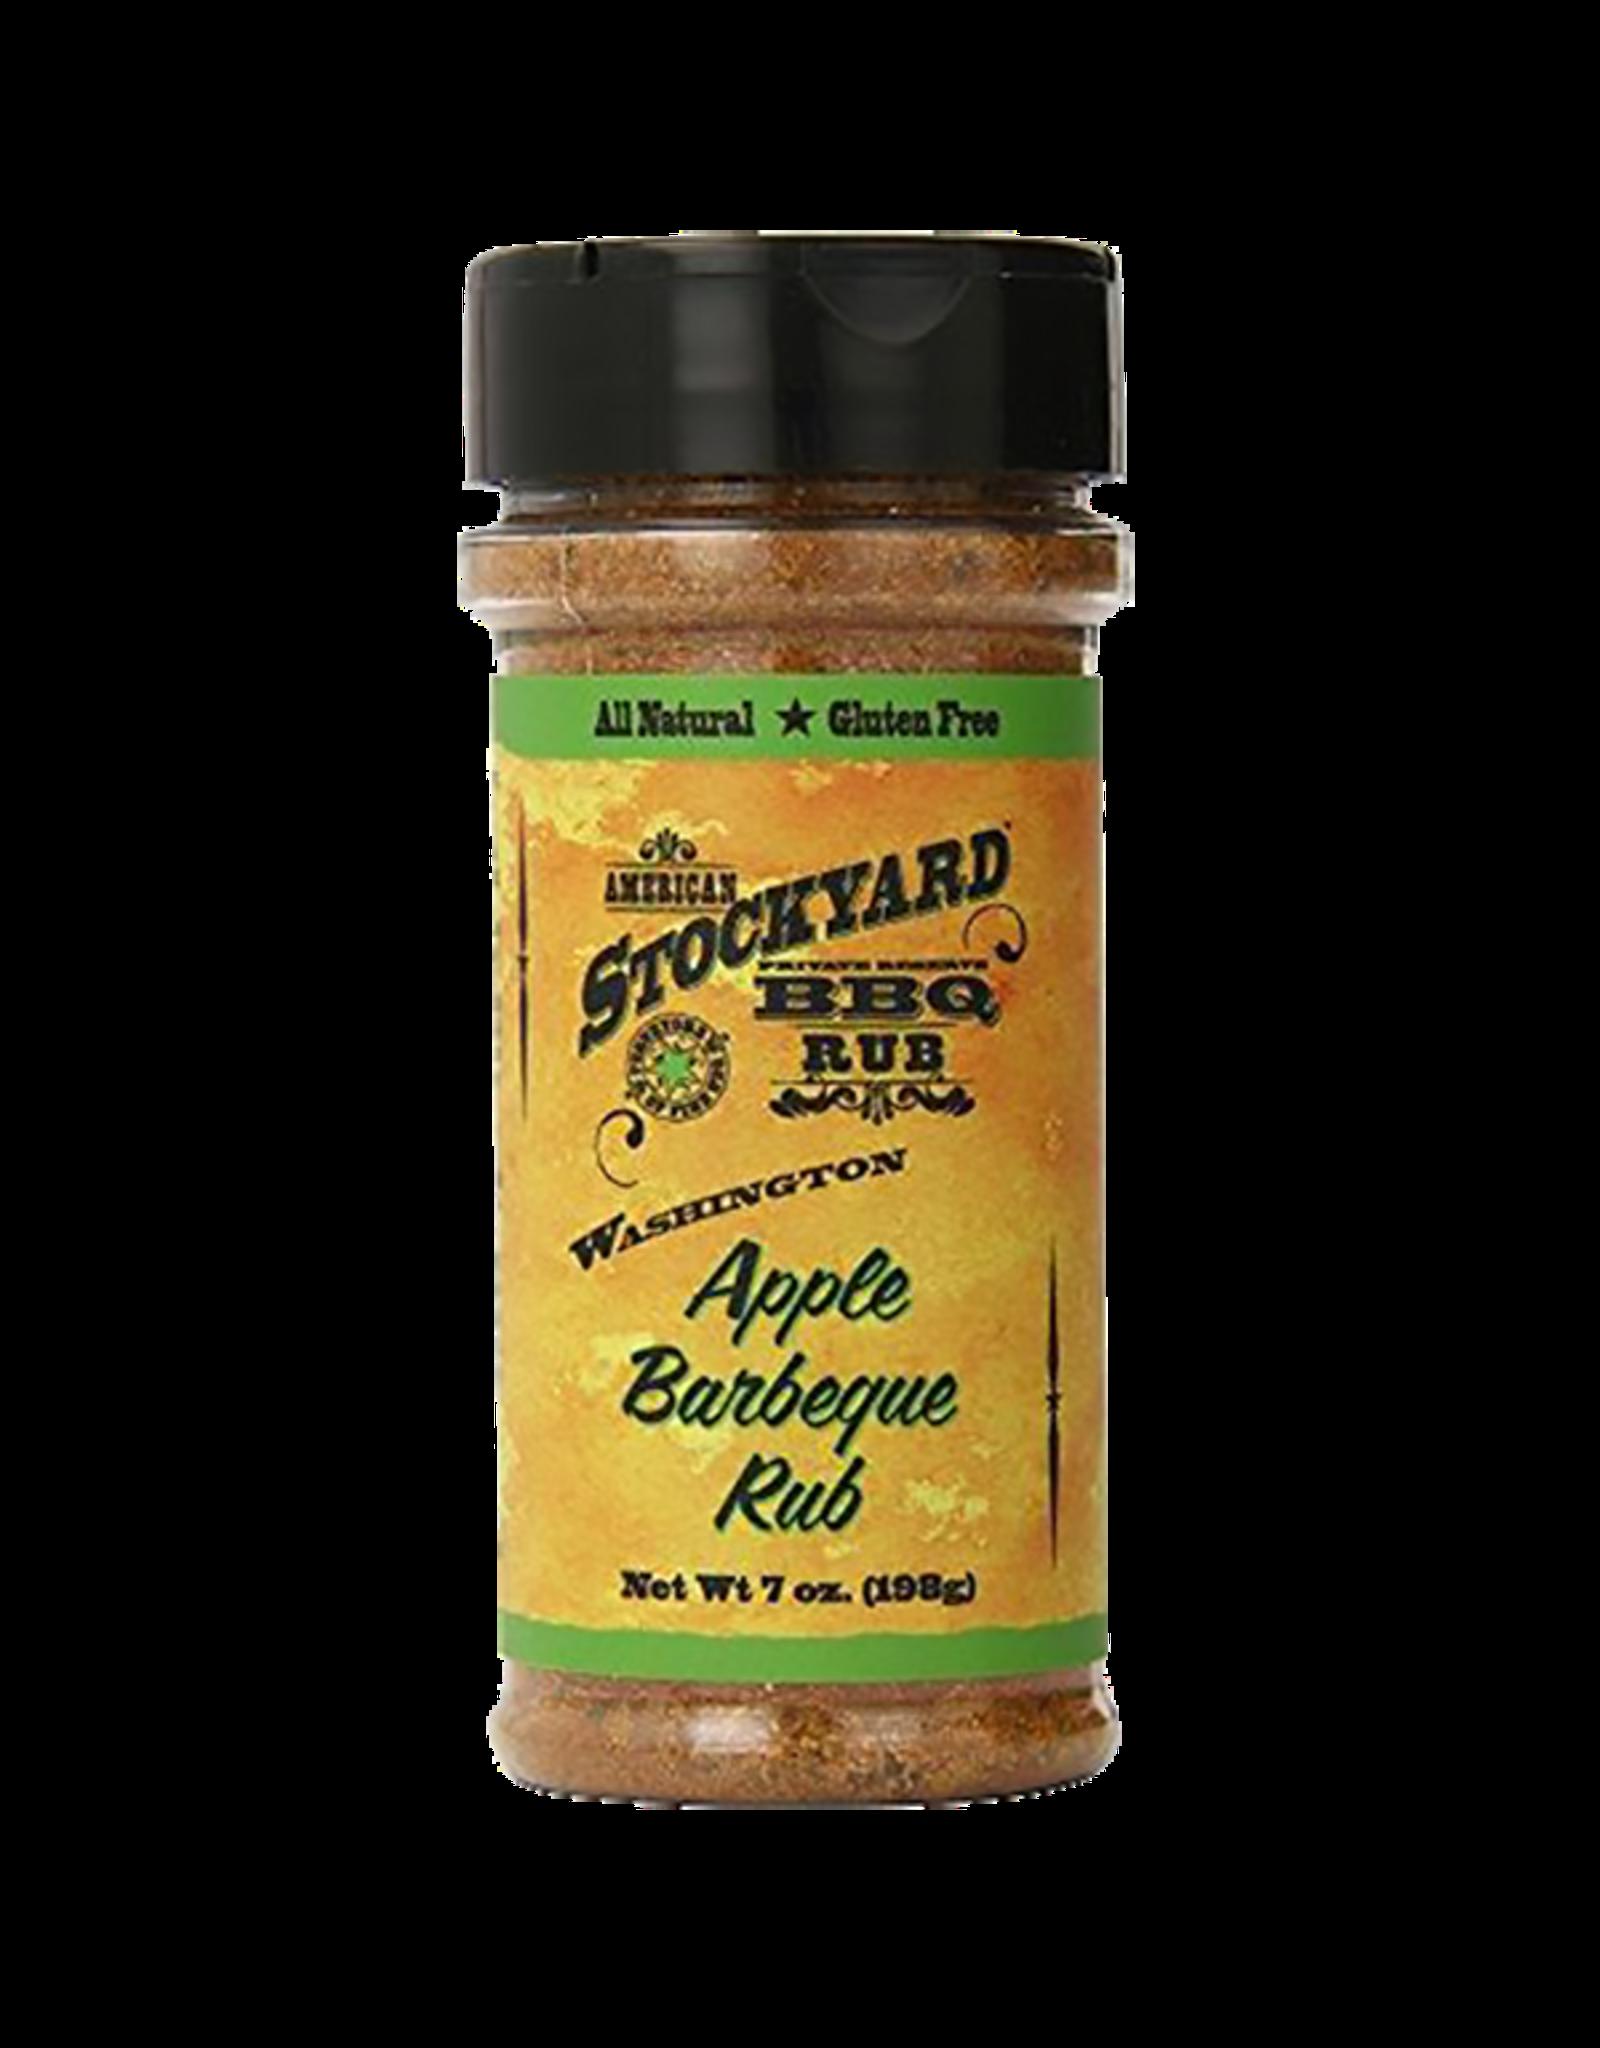 Stockyard Stockyard Apple BBQ Rub - 198gr